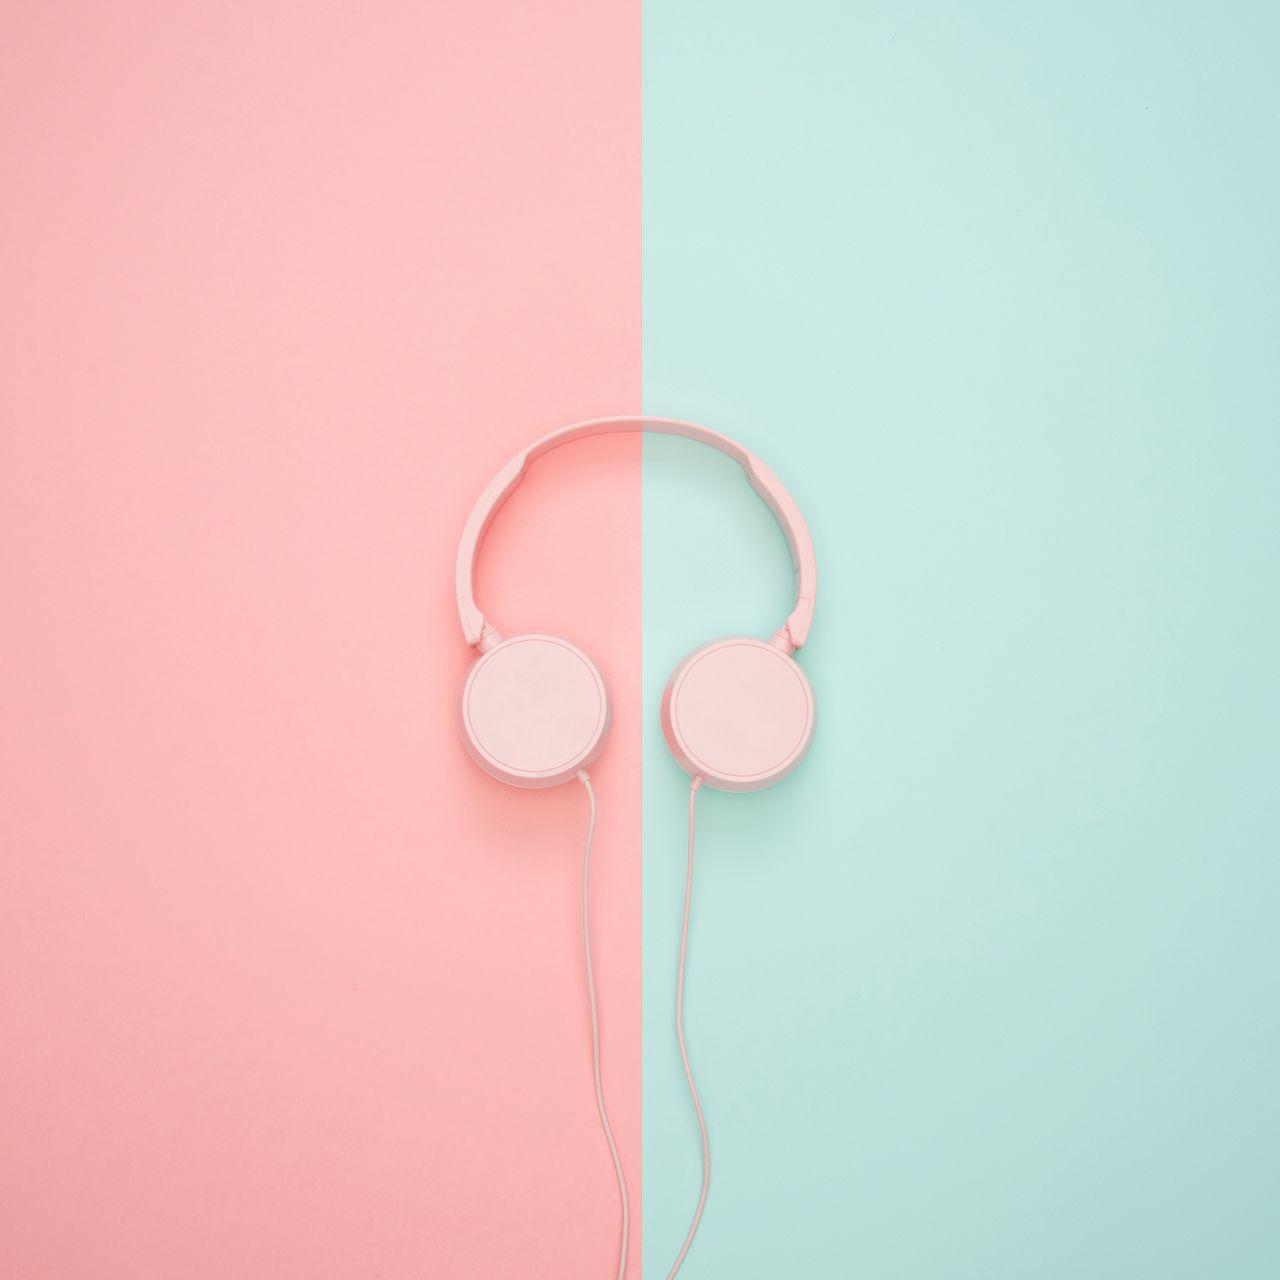 1280x1280 Wallpaper headphones, minimalism, pink, pastel